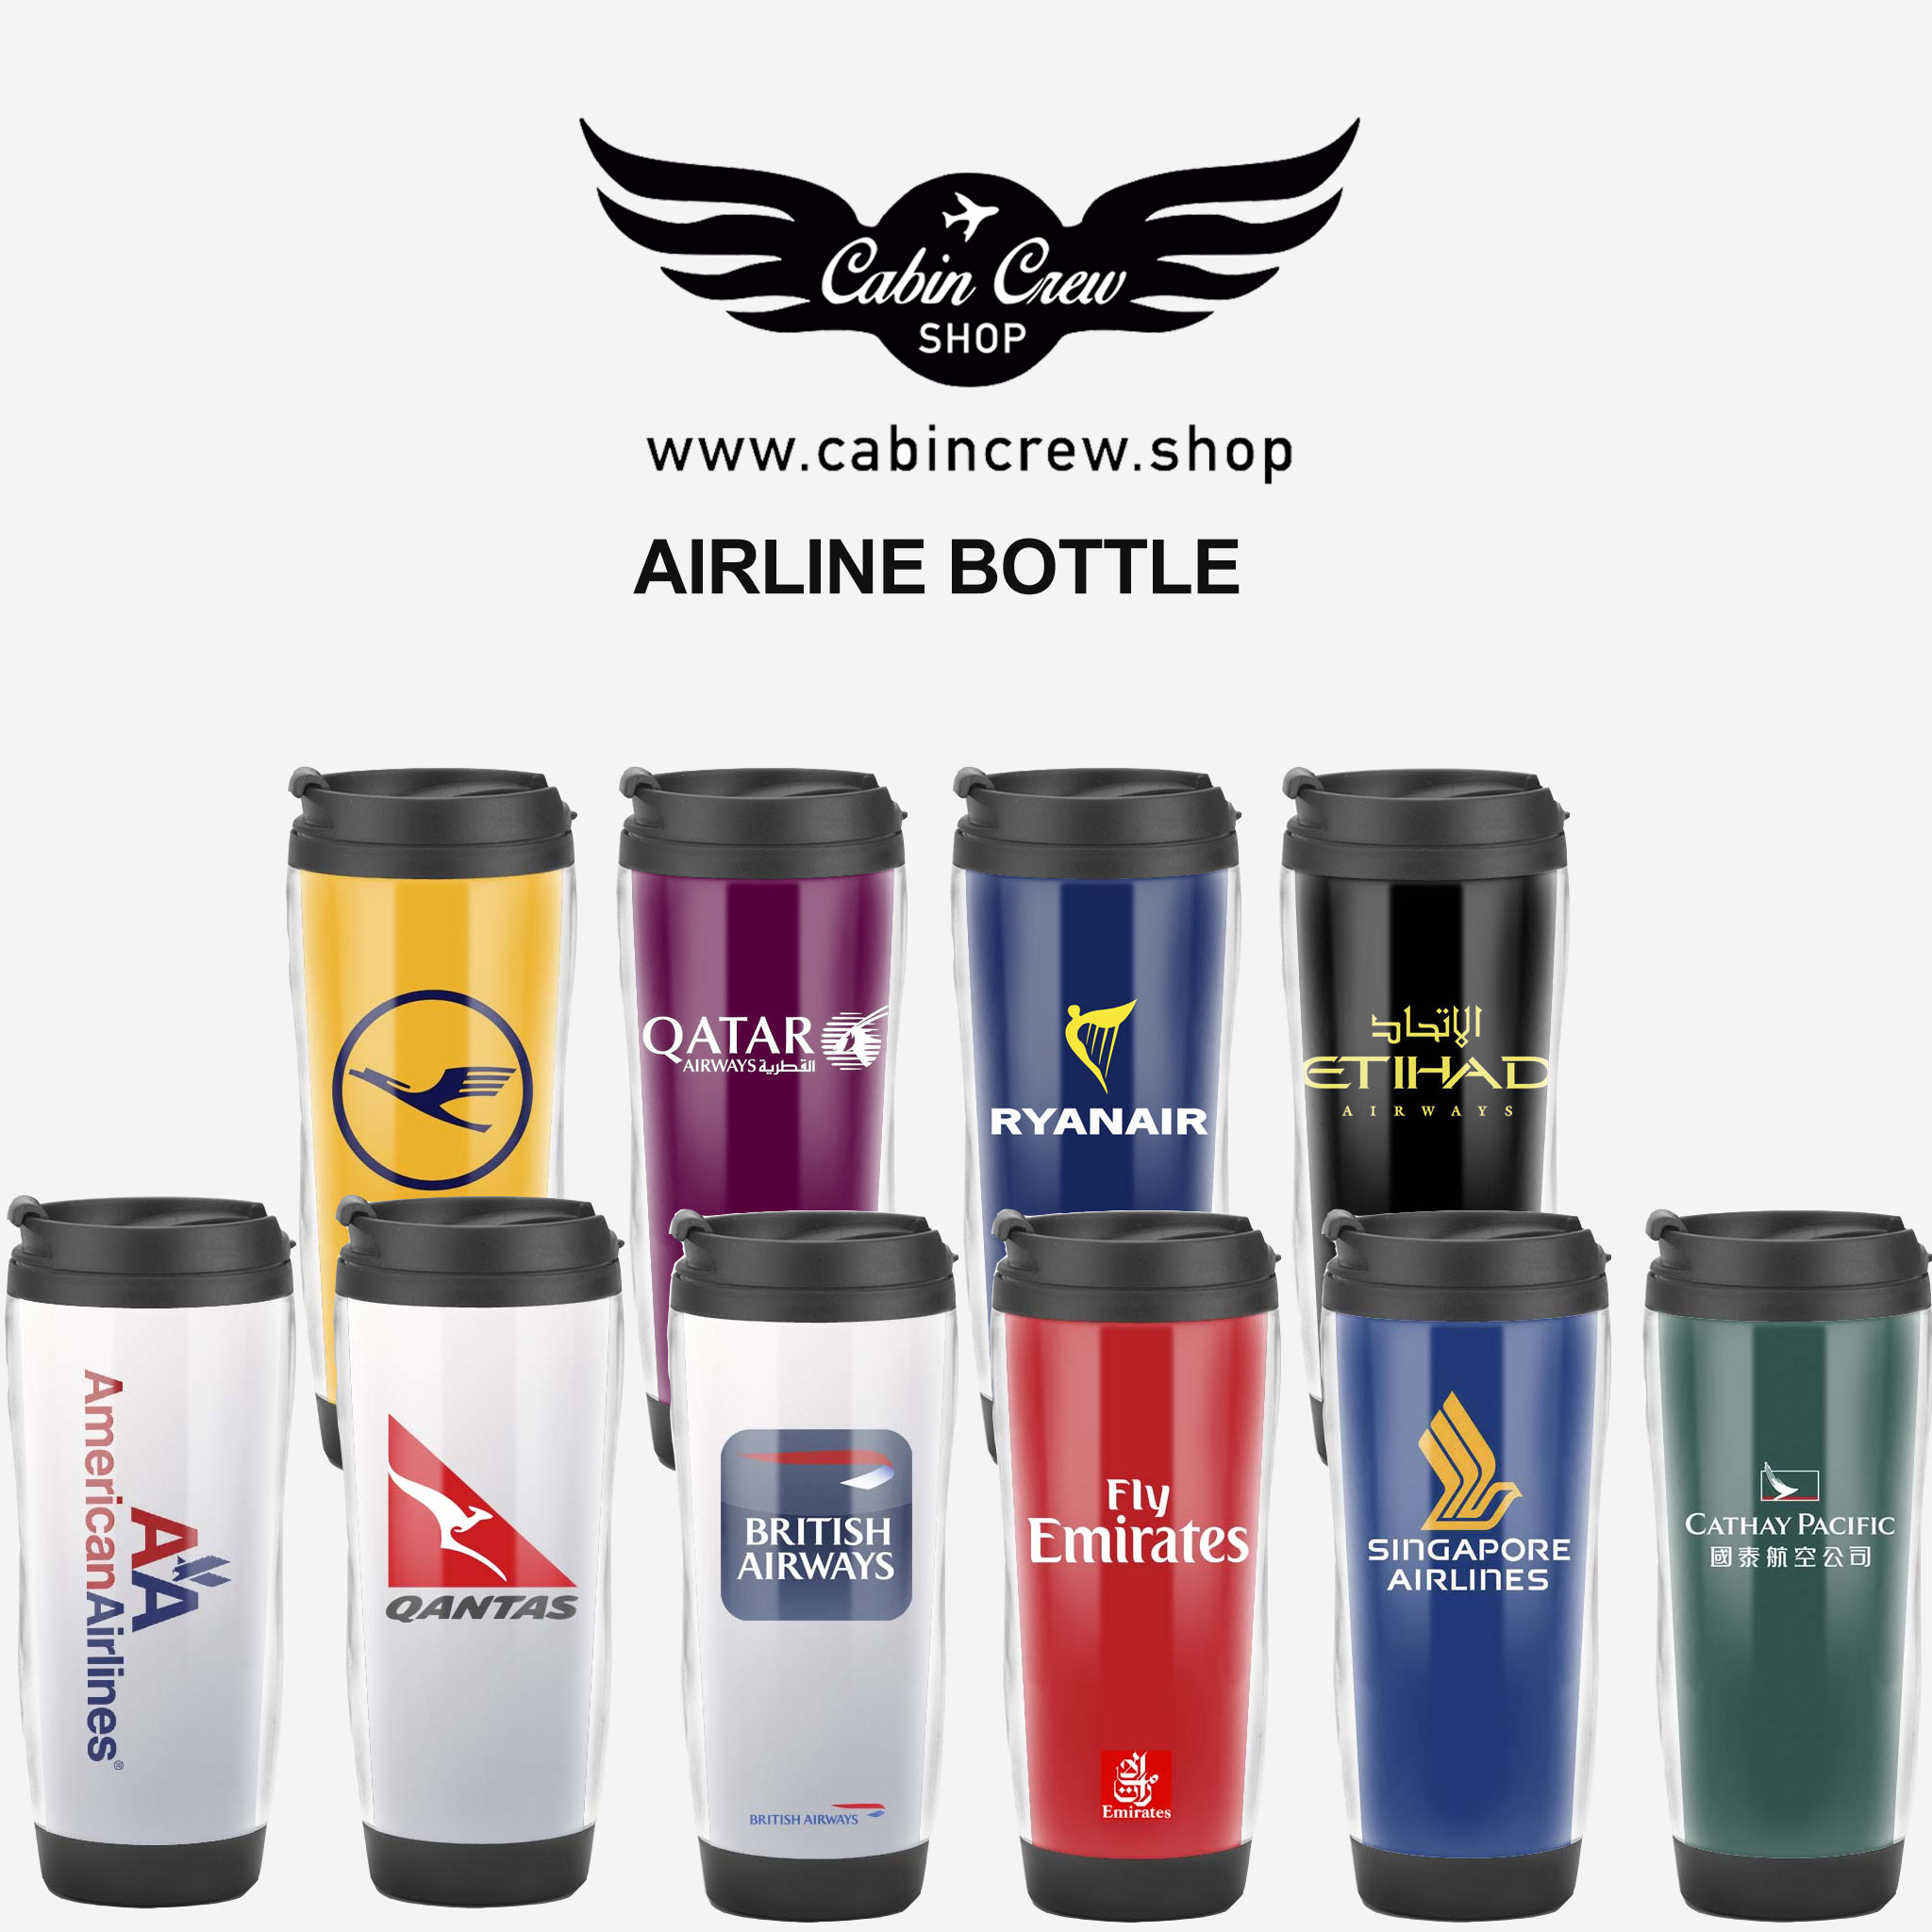 Airline Bottle